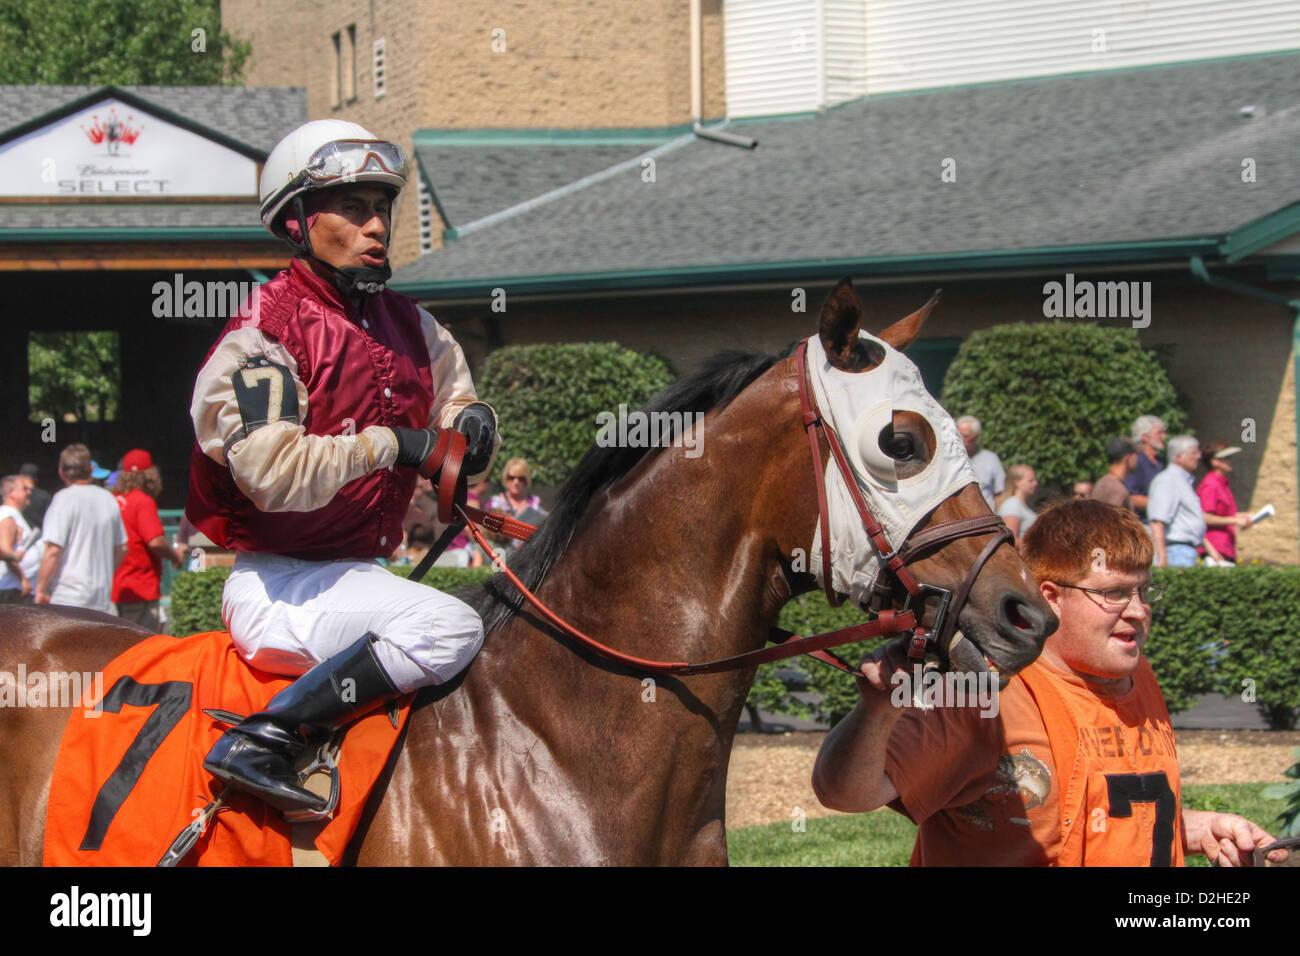 In the Paddock. Horse Racing at River Downs track, Cincinnati, Ohio, USA. - Stock Image